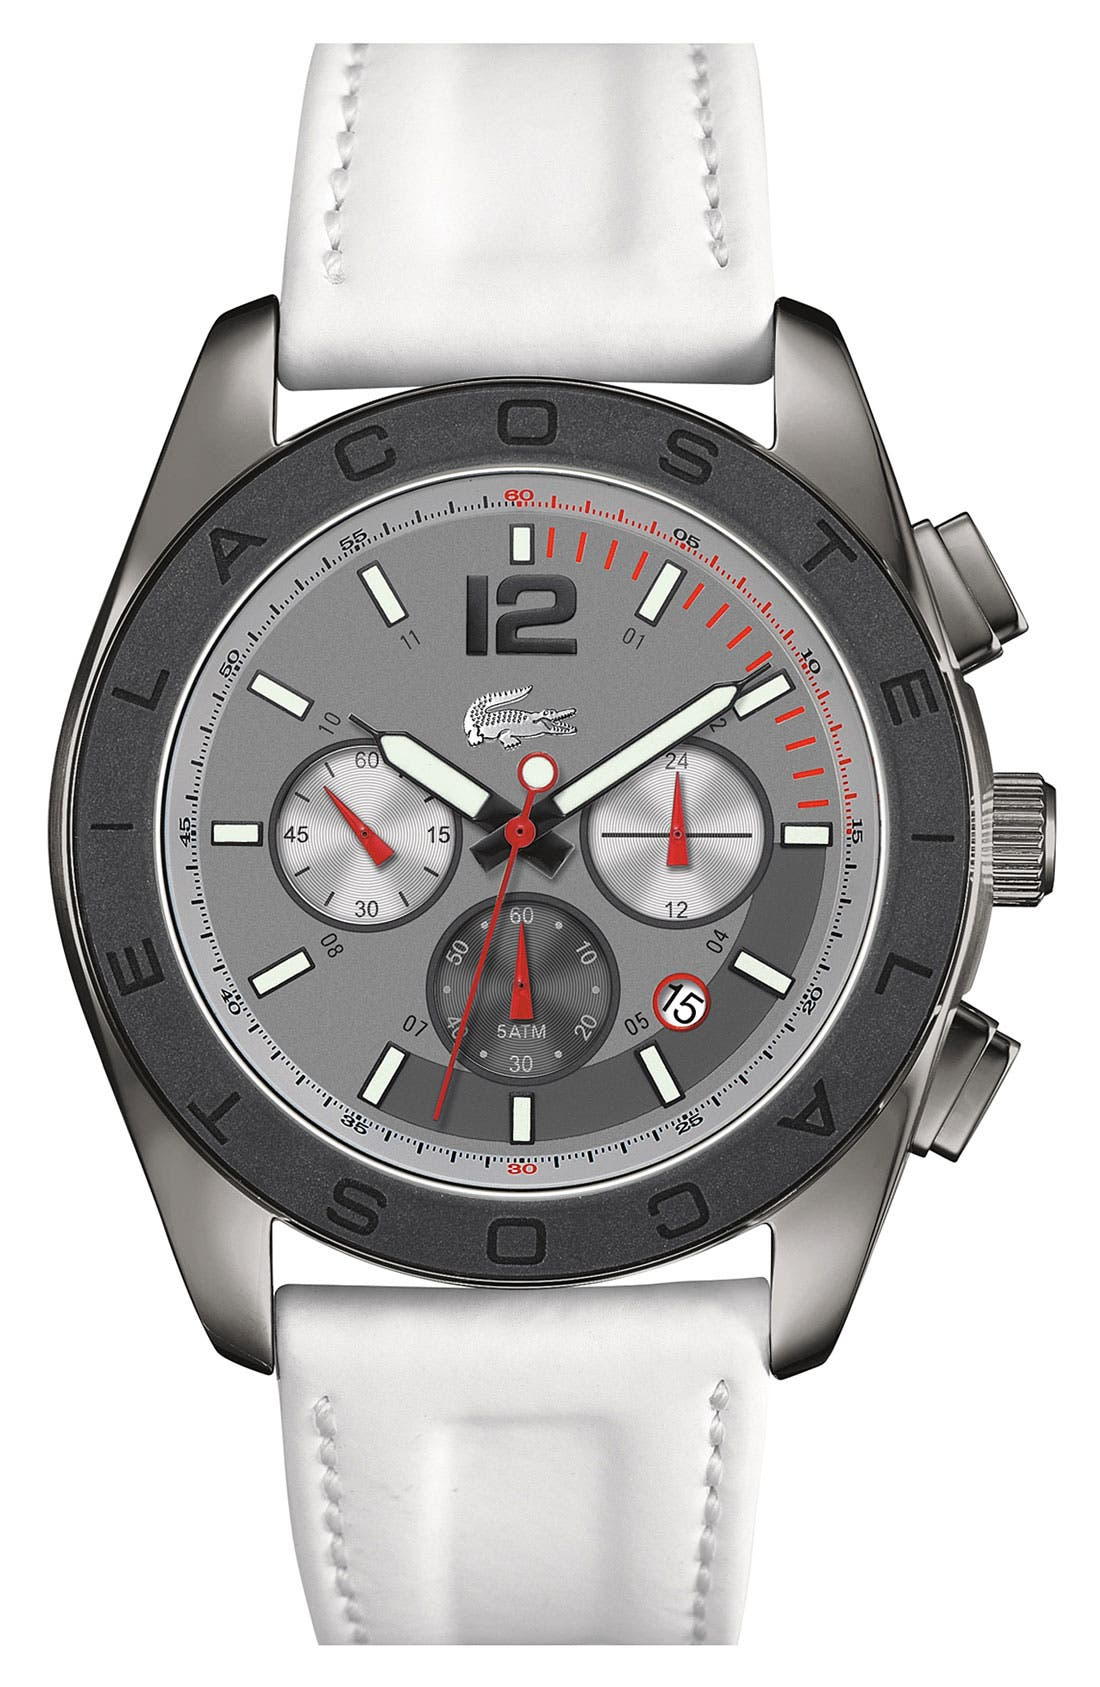 Main Image - Lacoste 'Panama' Chronograph Watch, 46mm